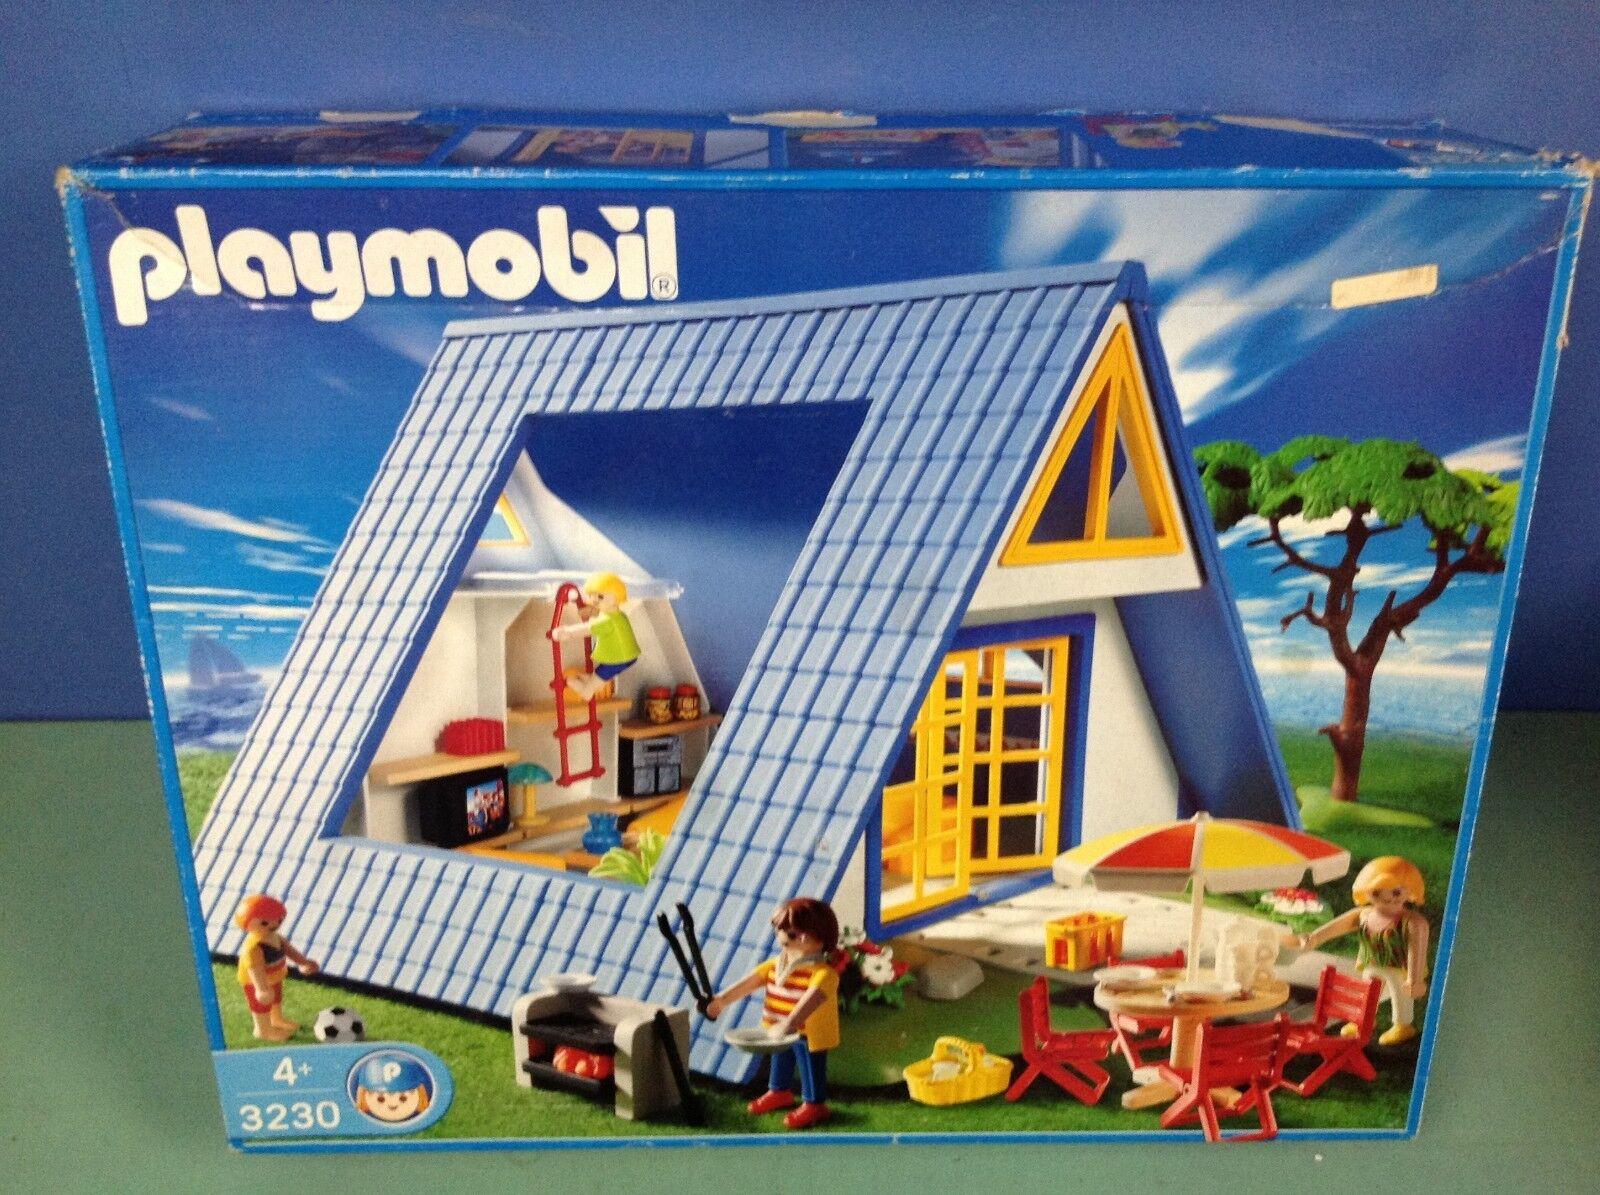 (P3230) Playmobil Haus Blau Ref. 3230 in Schachtel Komplett